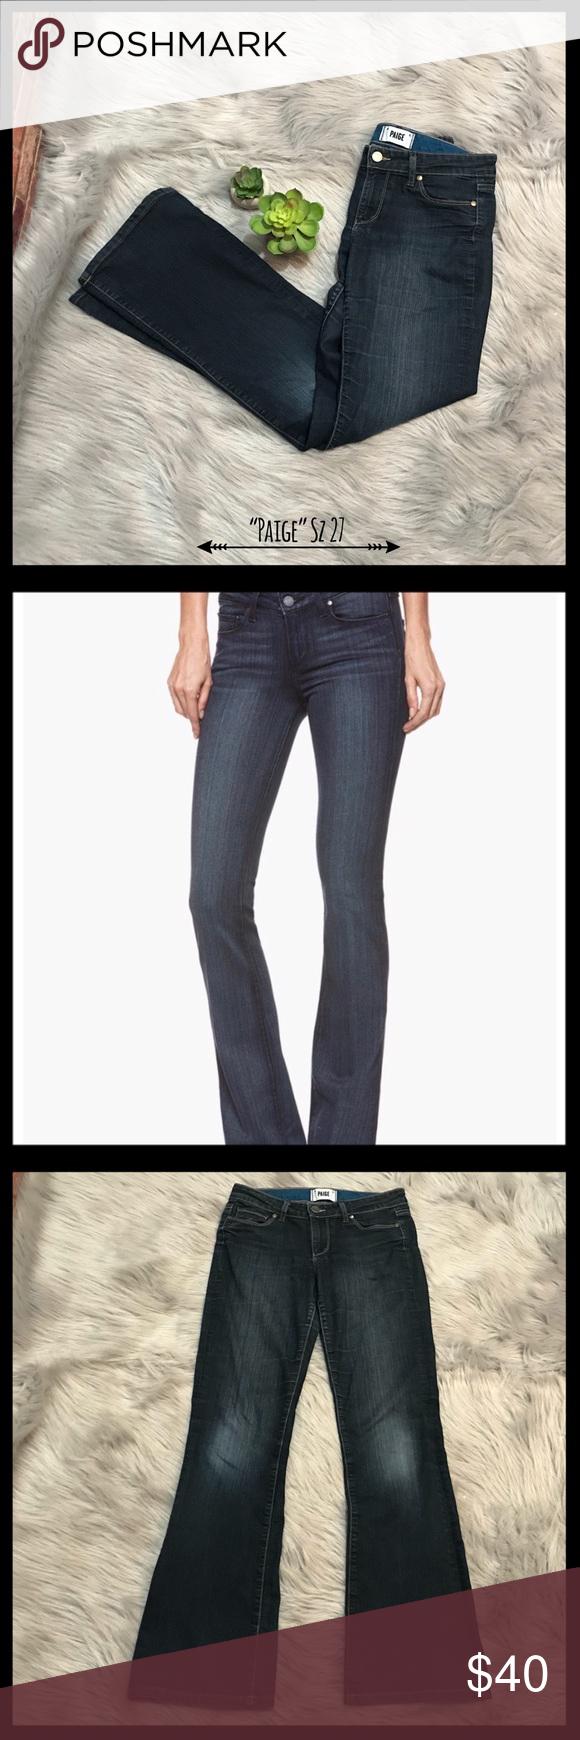 b15f50c2a84 Paige Skyline Bootcut Michelle Wash Jeans Paige Skyline Bootcut Michelle  Wash Jeans in a size 27